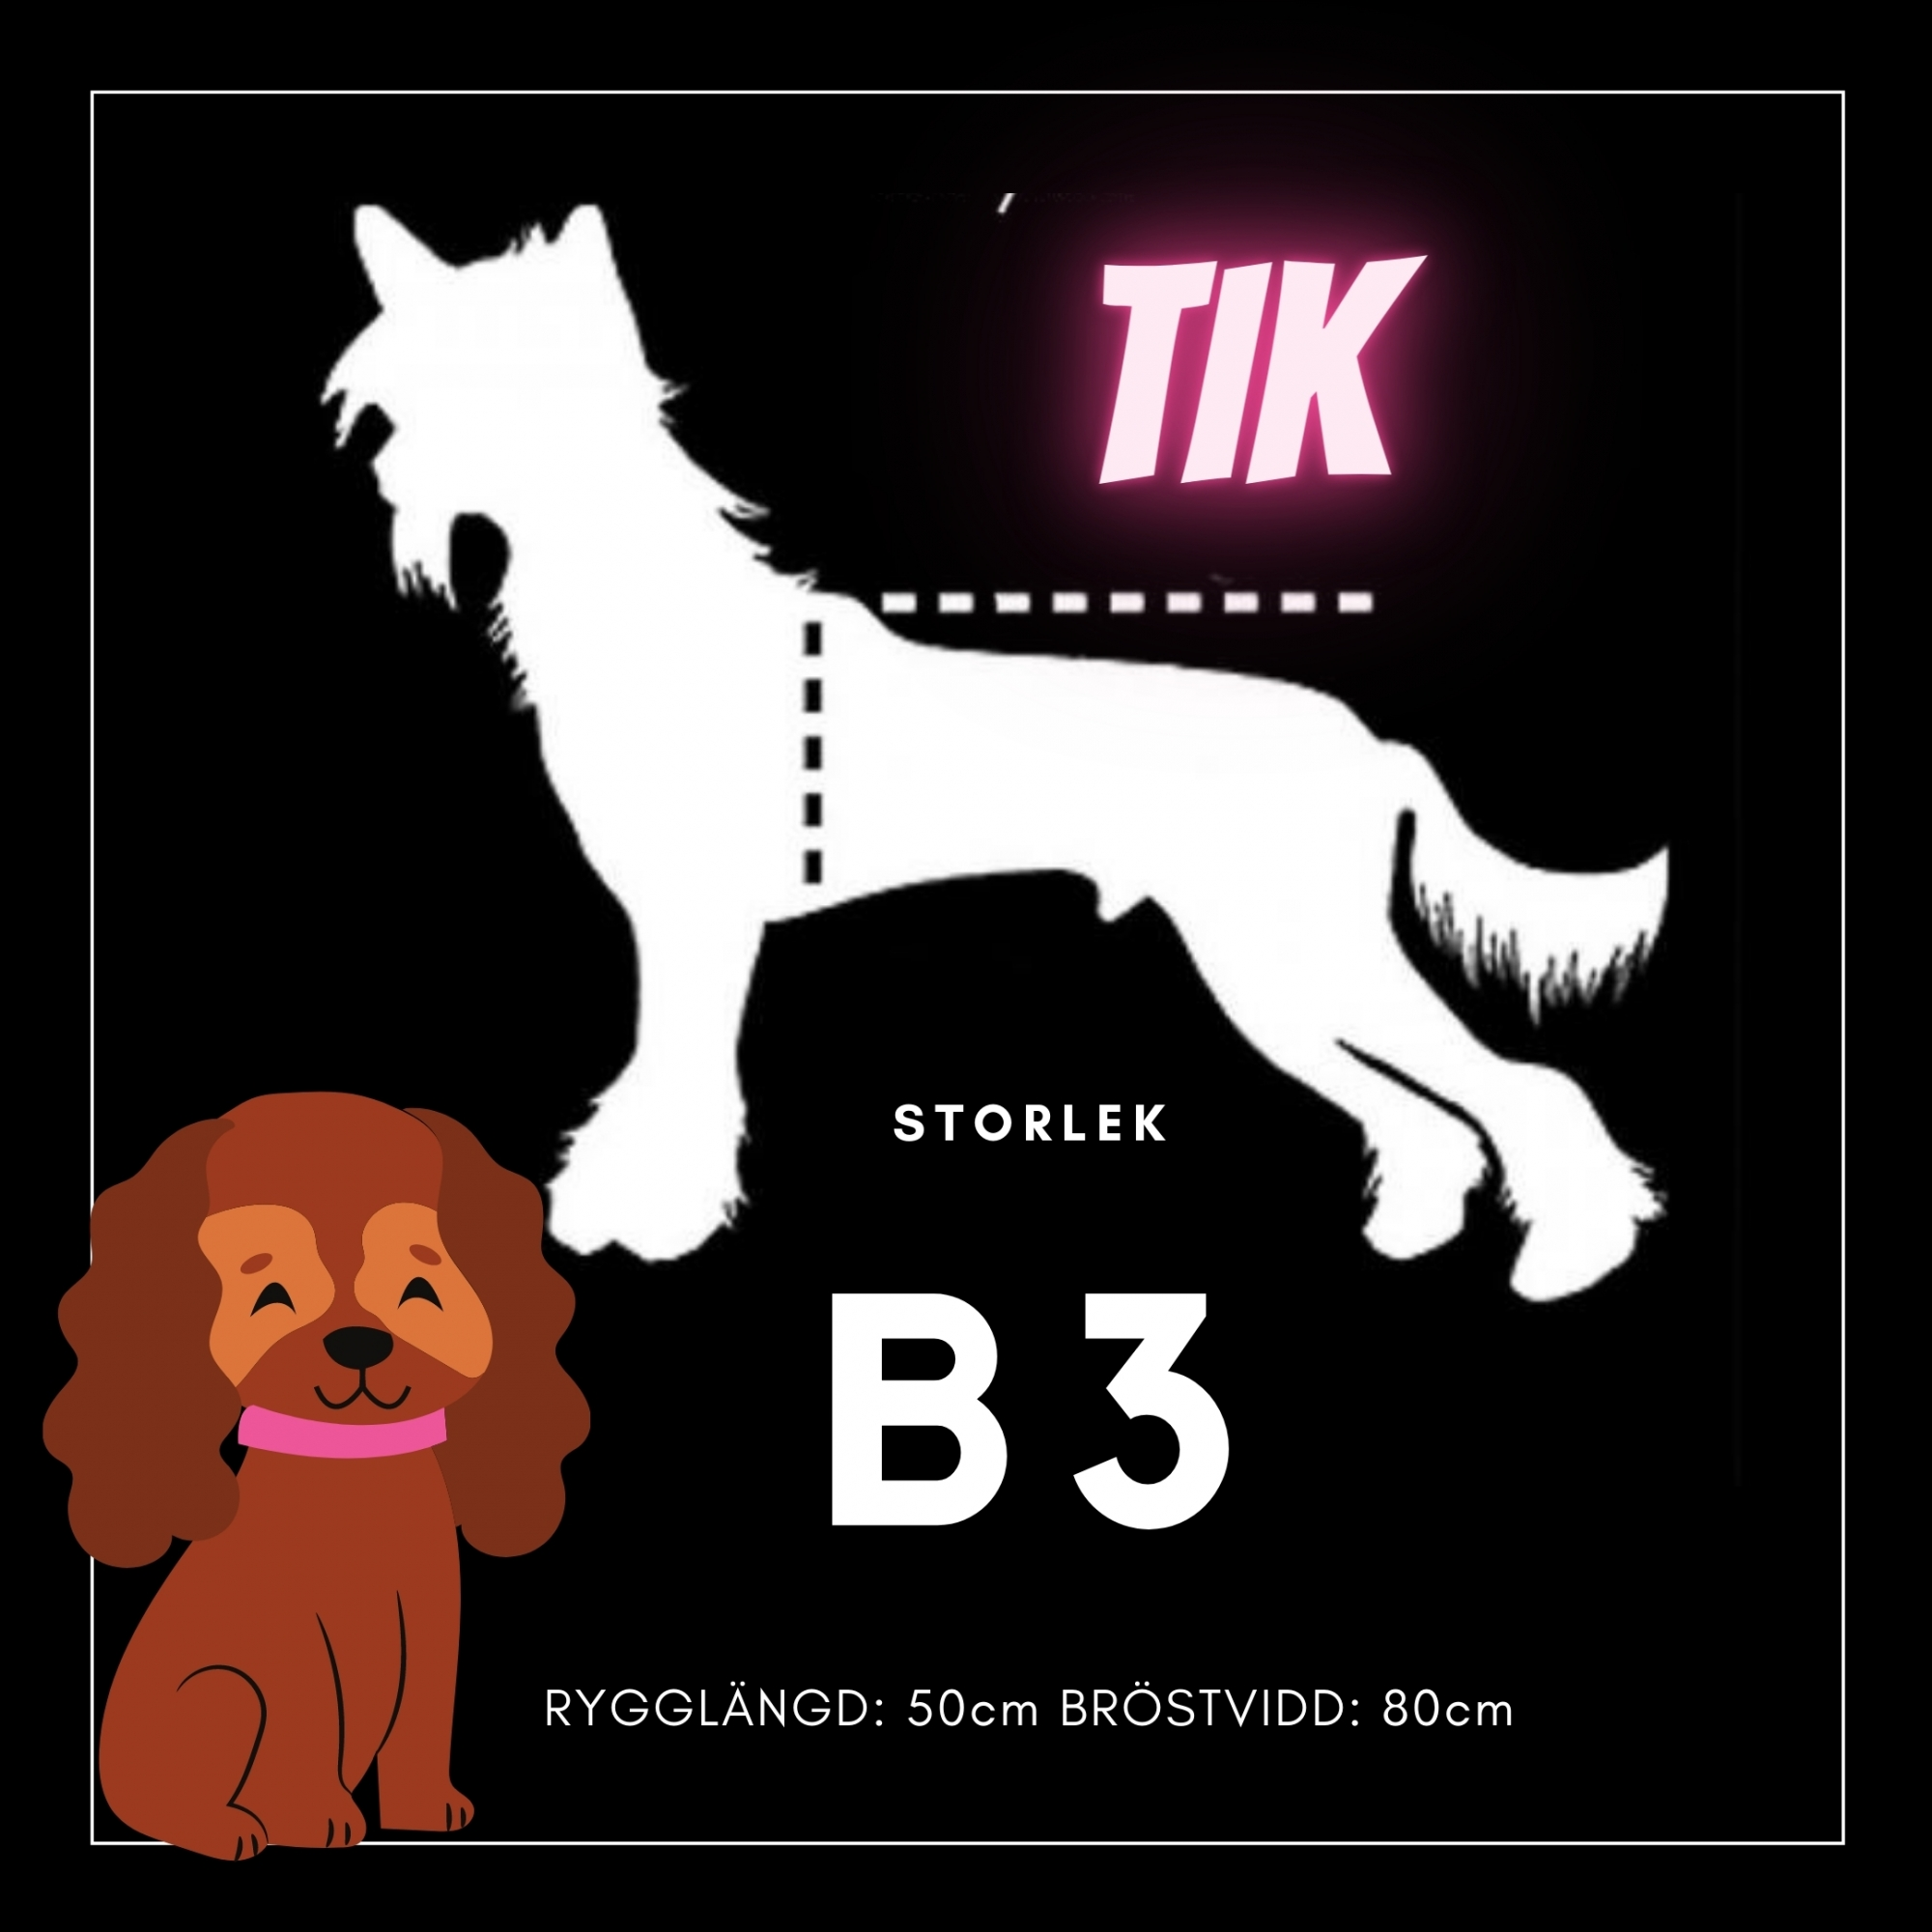 Tik Storlek B3 - Passion For Pet Fashion